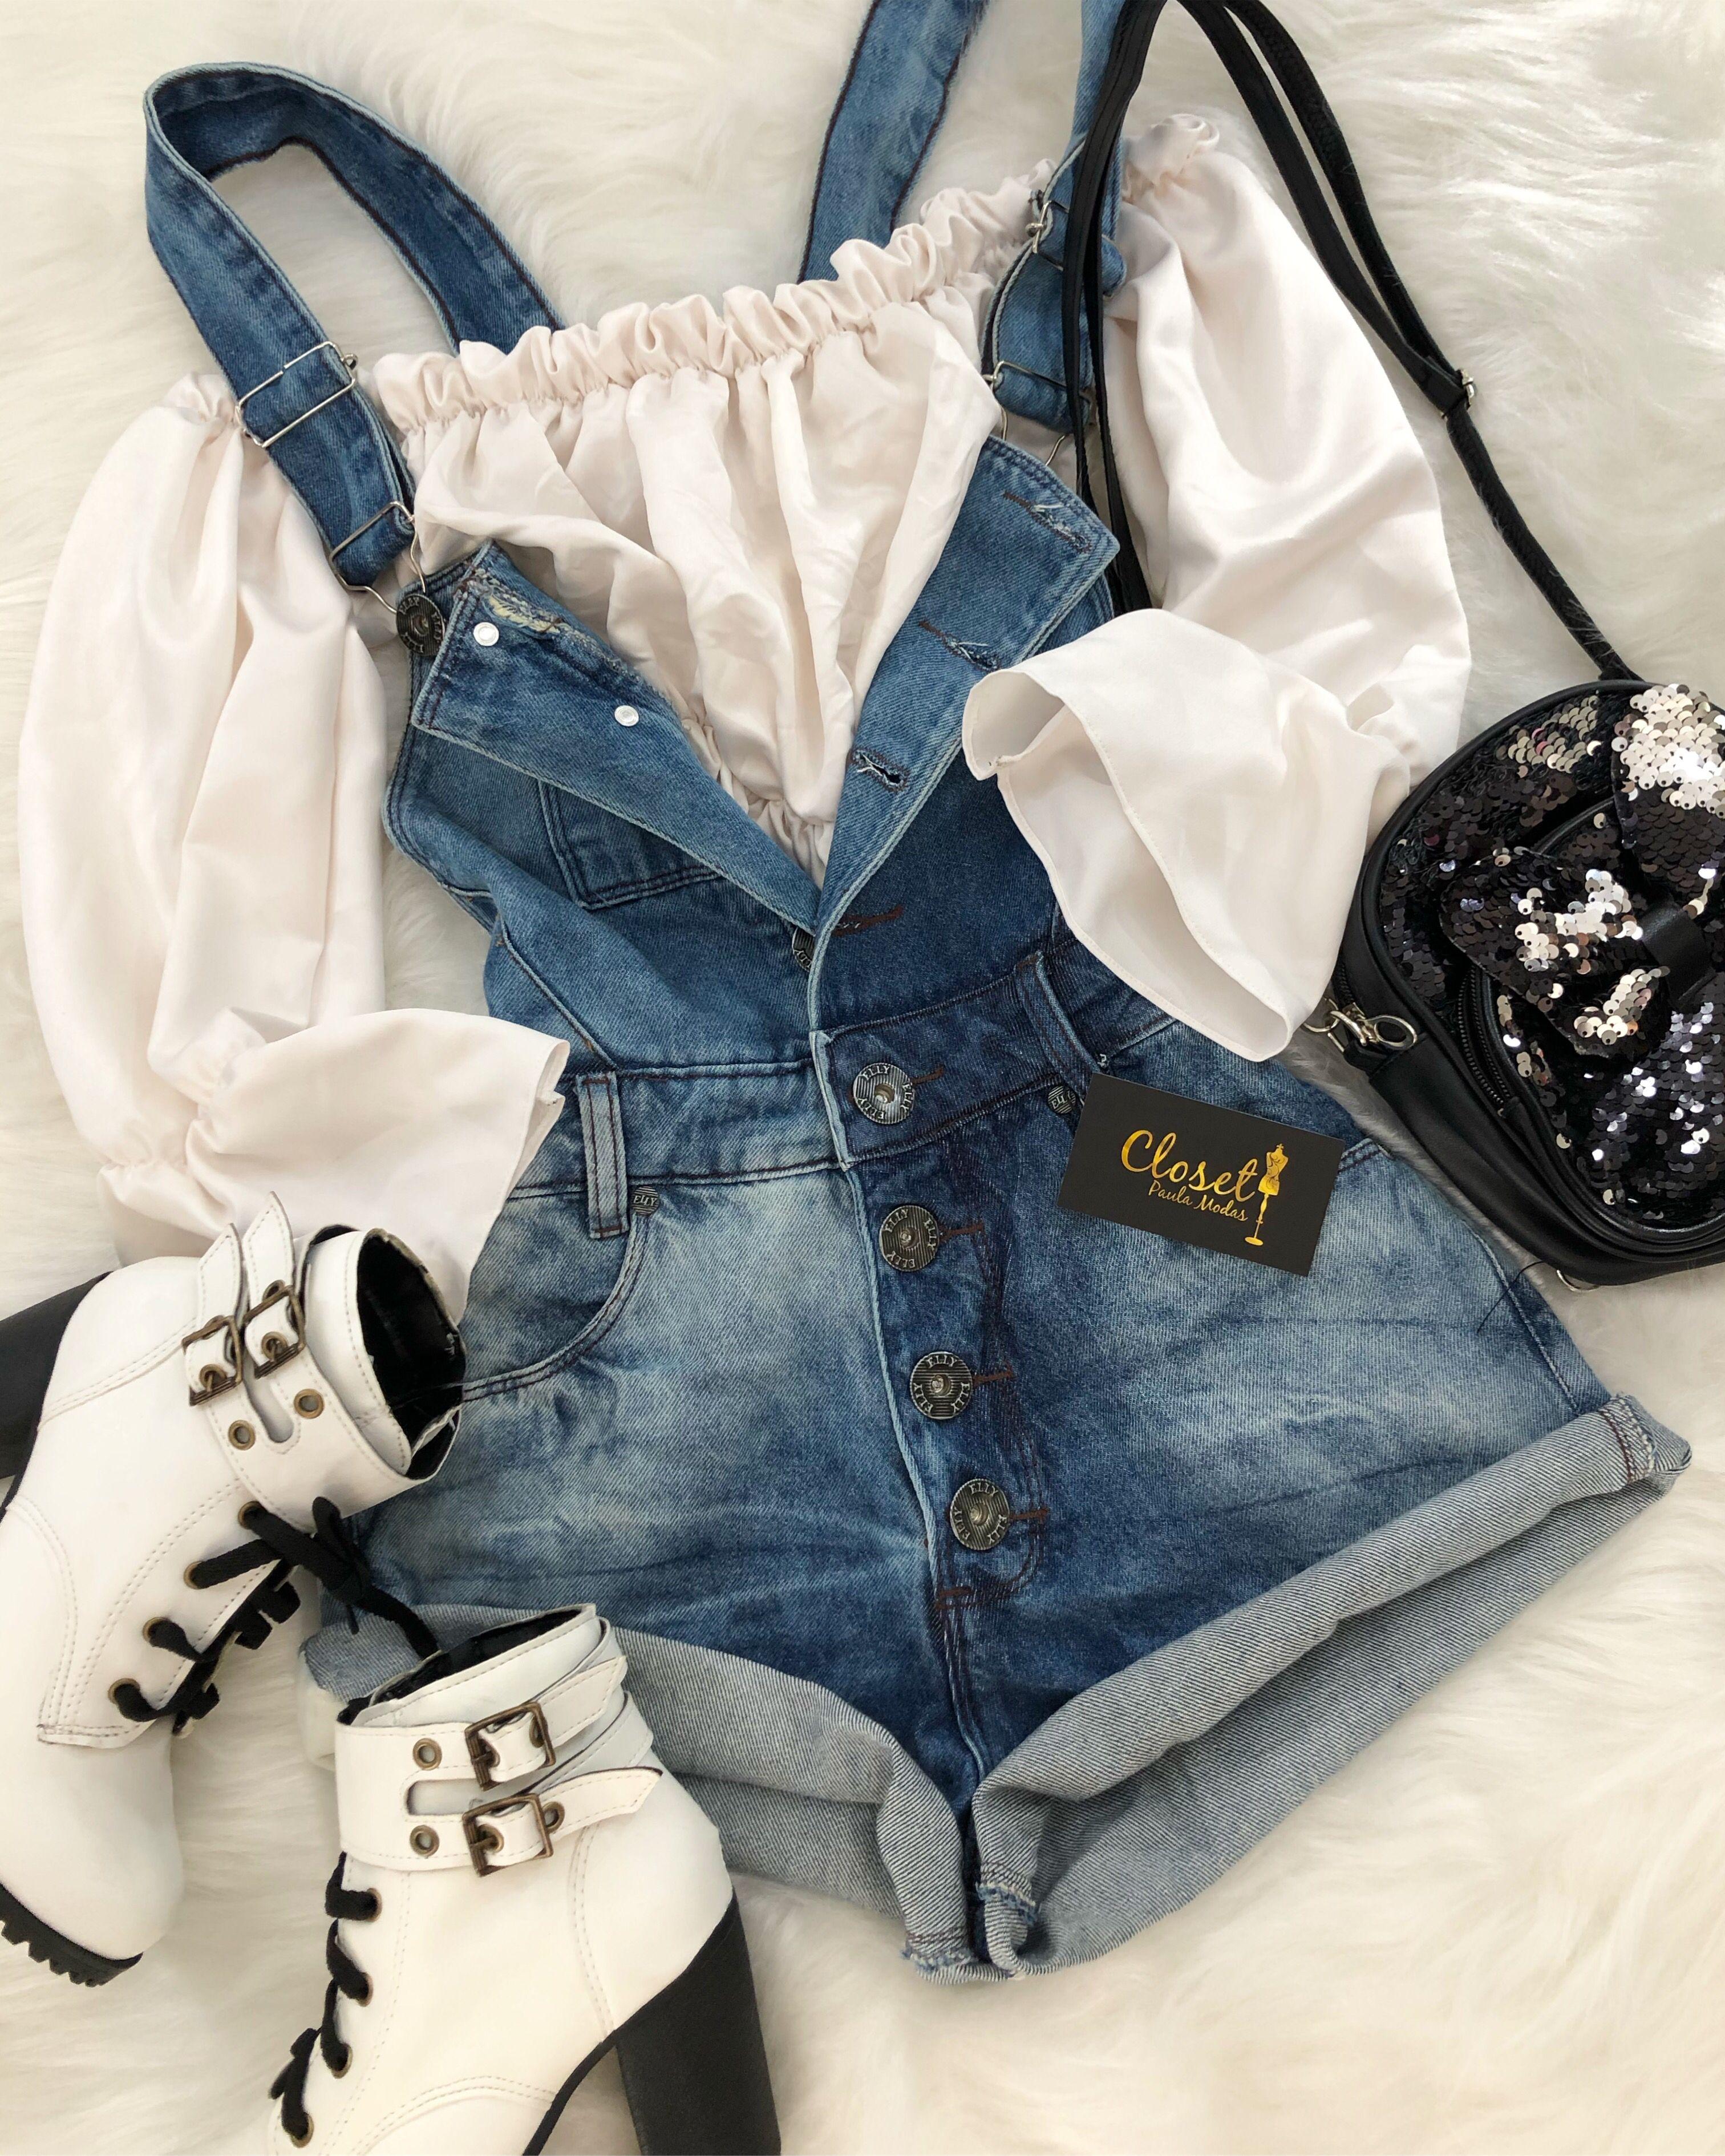 Pin de Paula Ramirez en ropa | Pinterest | Ropa, Ropa tumblr